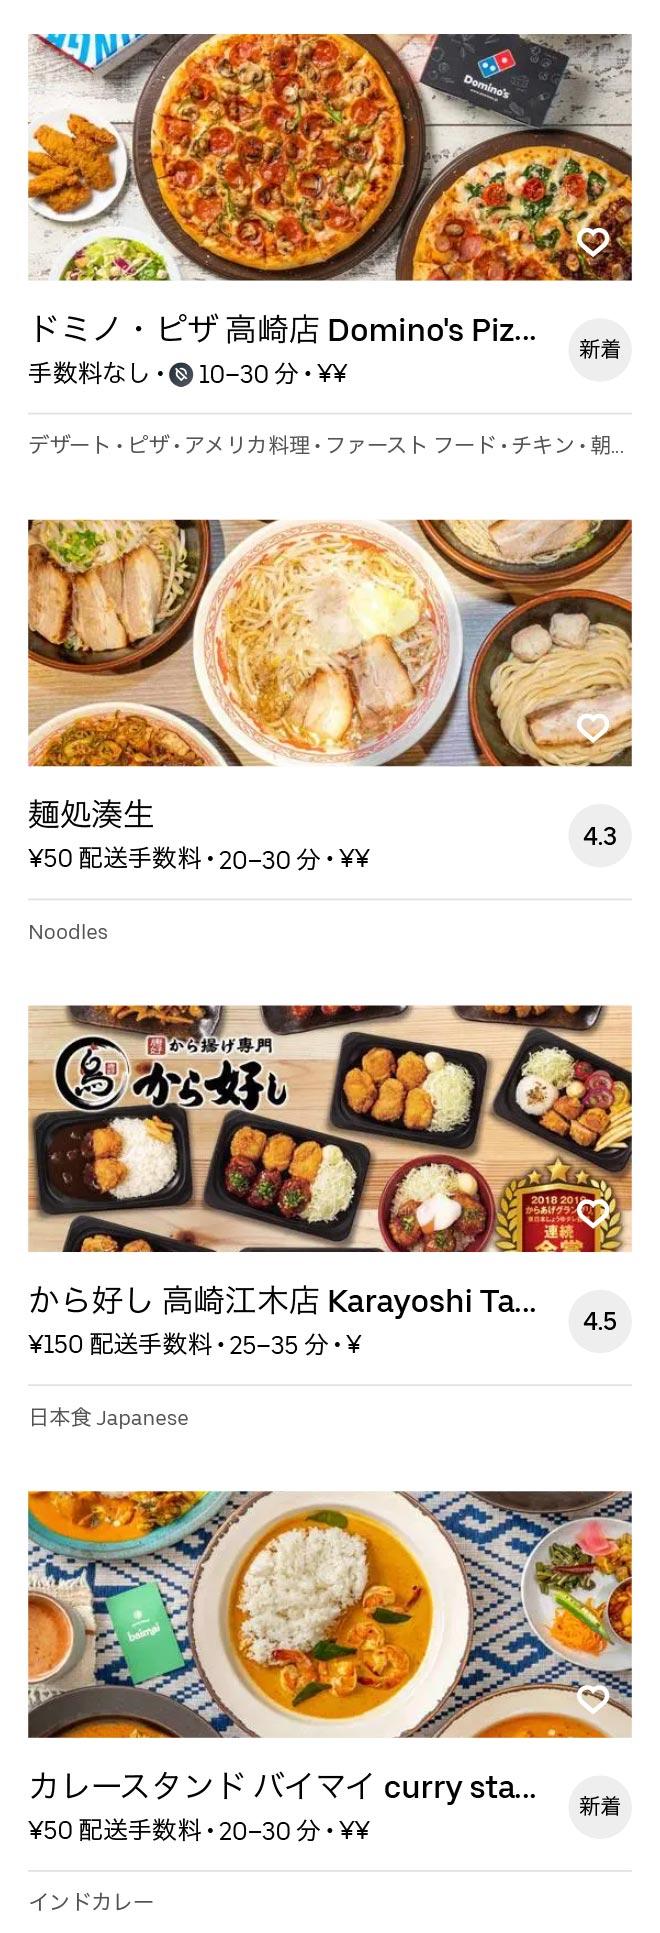 Takasaki menu 2010 03